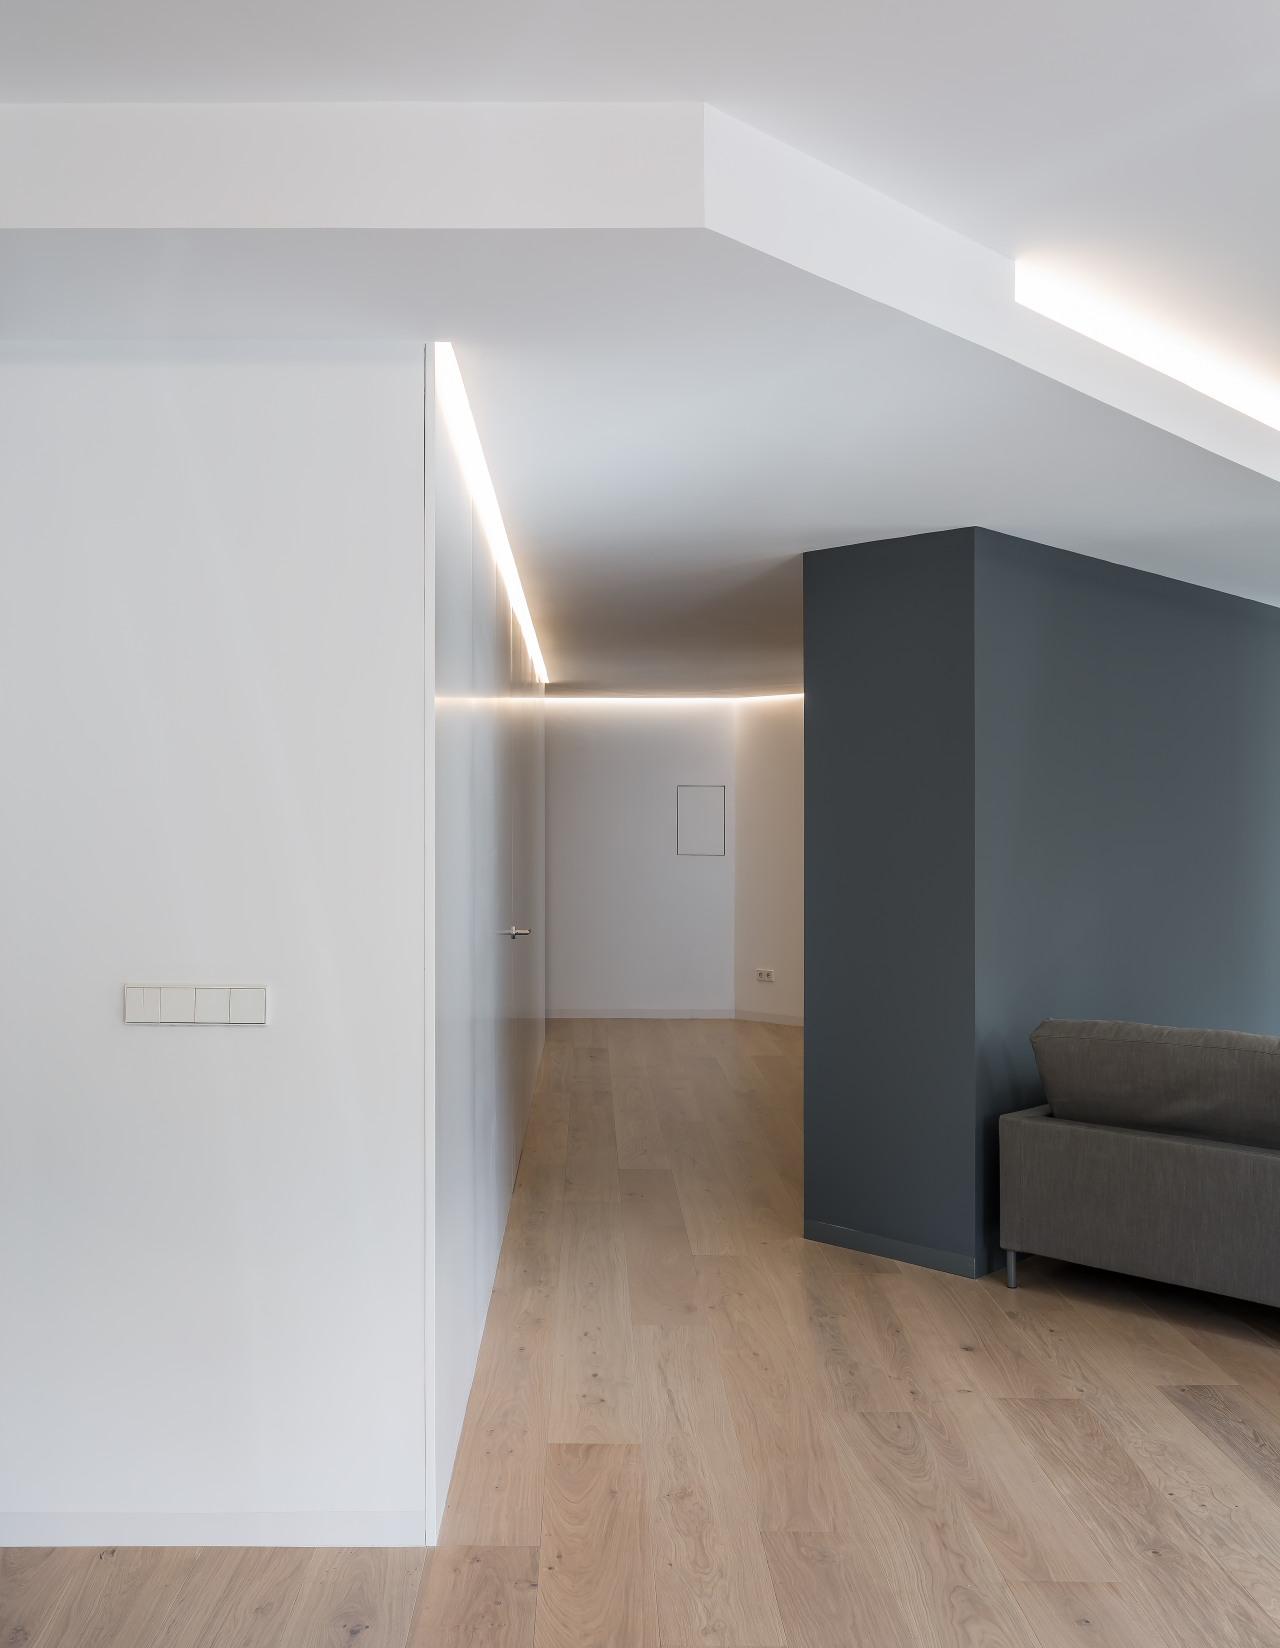 fotografia-arquitectura-interiorismo-valencia-german-cabo-gallardo-llopis-bfm-edificatoria-turia02 (15)